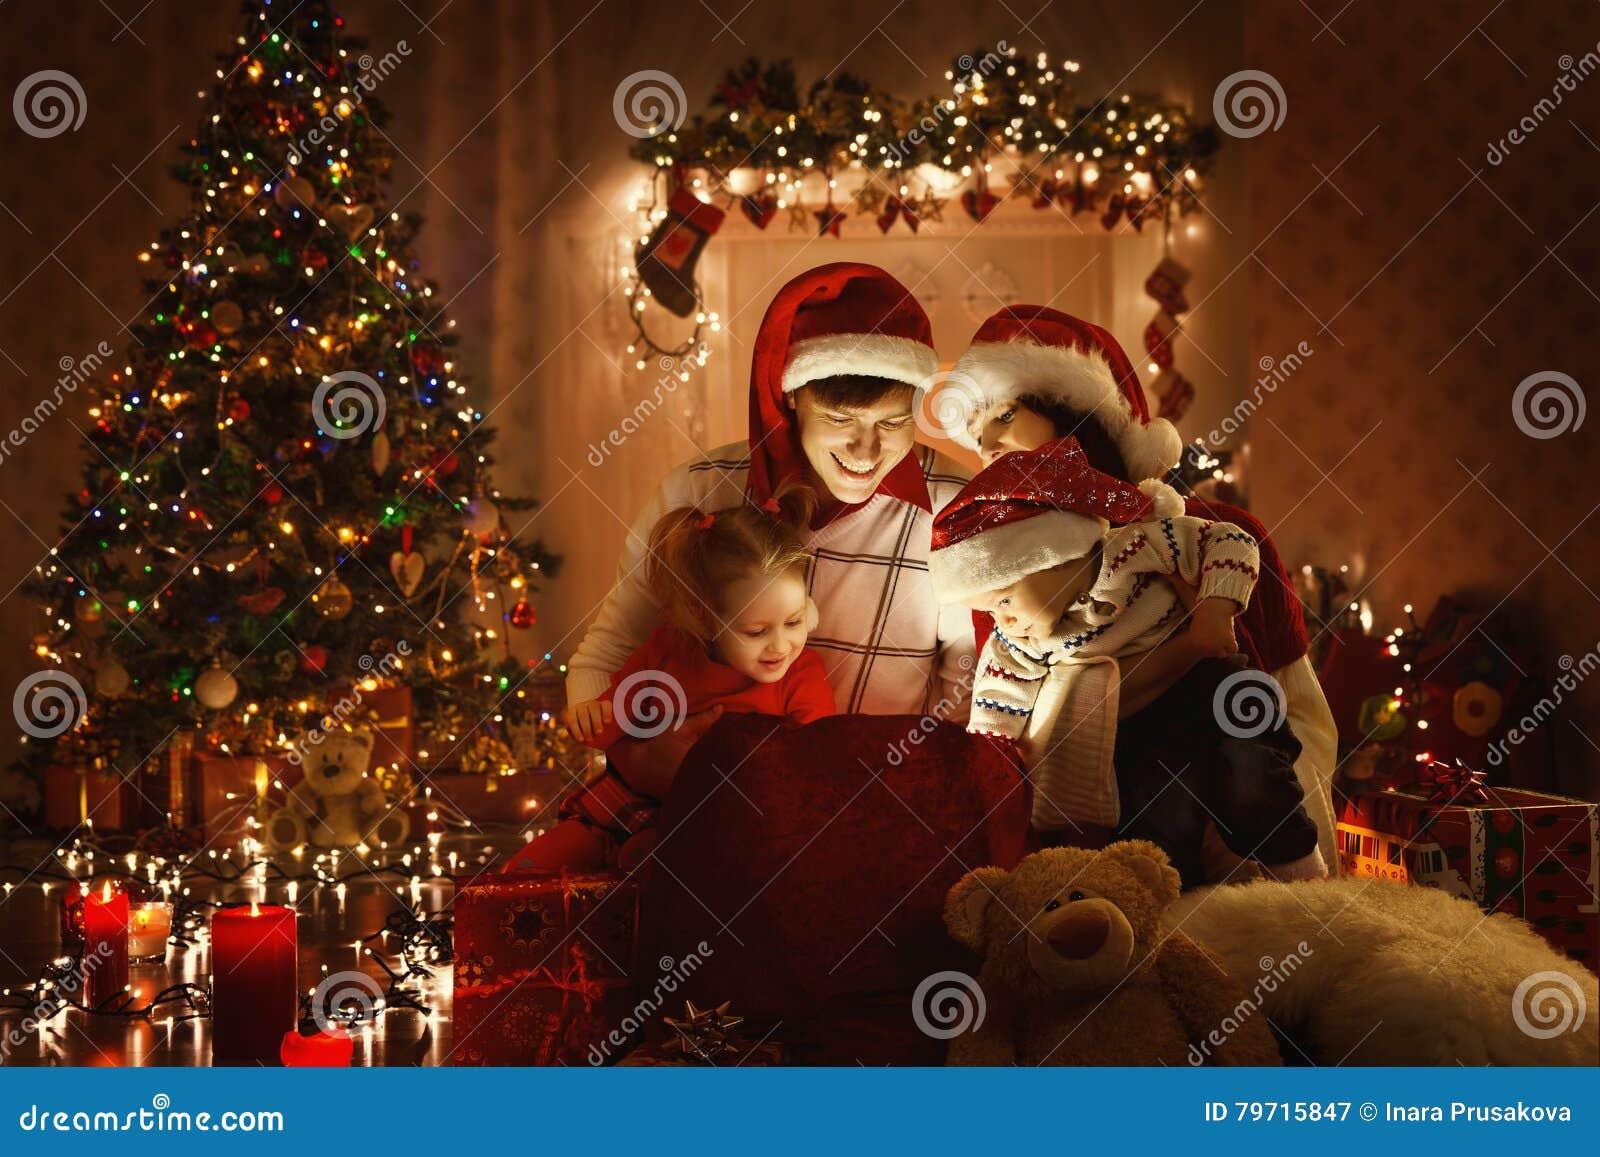 Christmas Family Open Present Gift, Xmas Tree Lights Interior